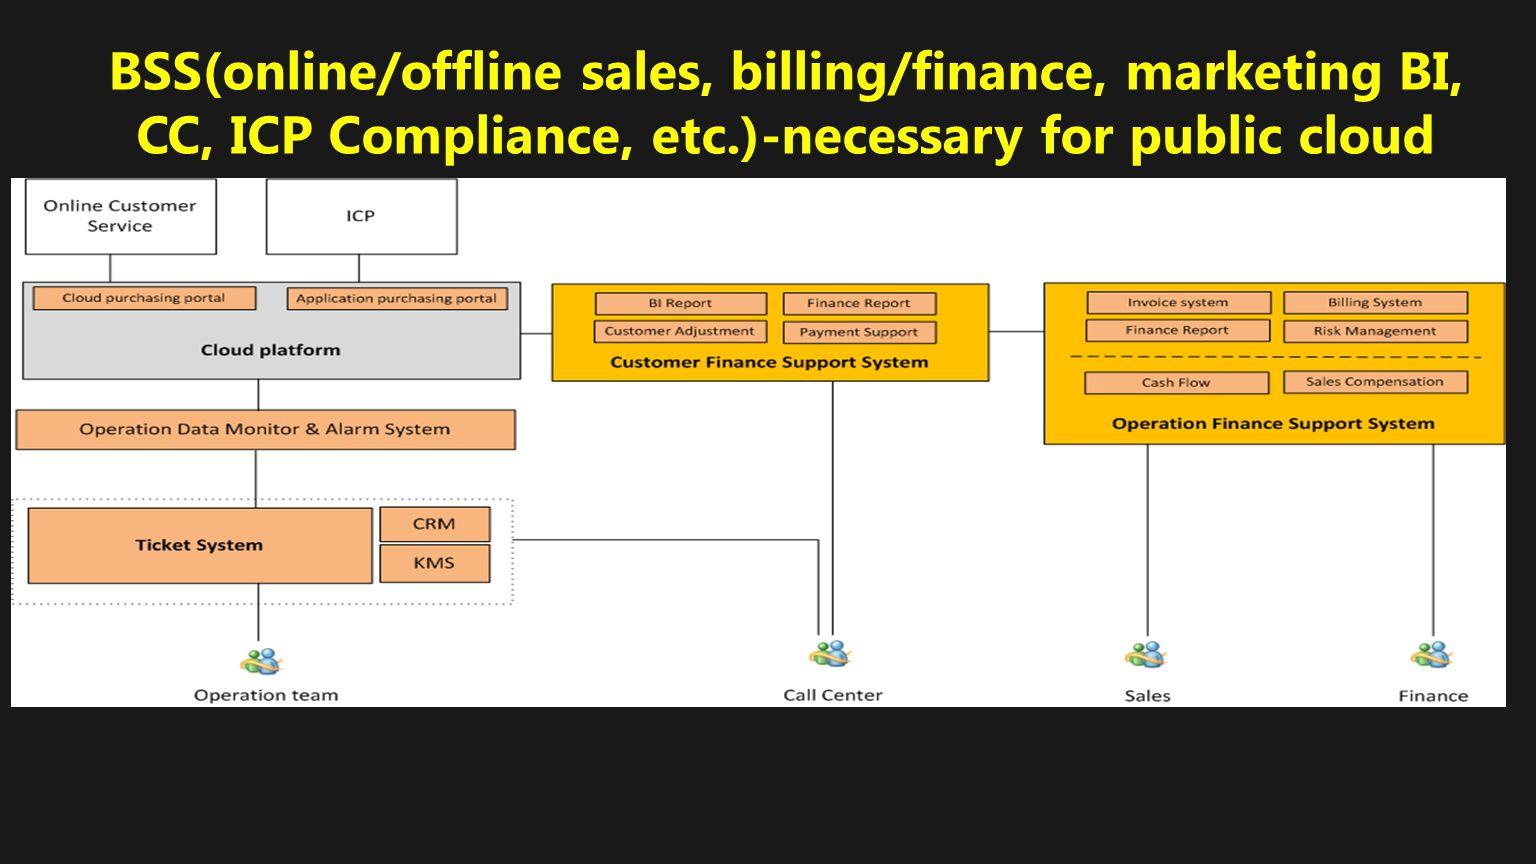 BSS(online/offline sales, billing/finance, marketing BI, CC, ICP Compliance, etc.)-necessary for public cloud